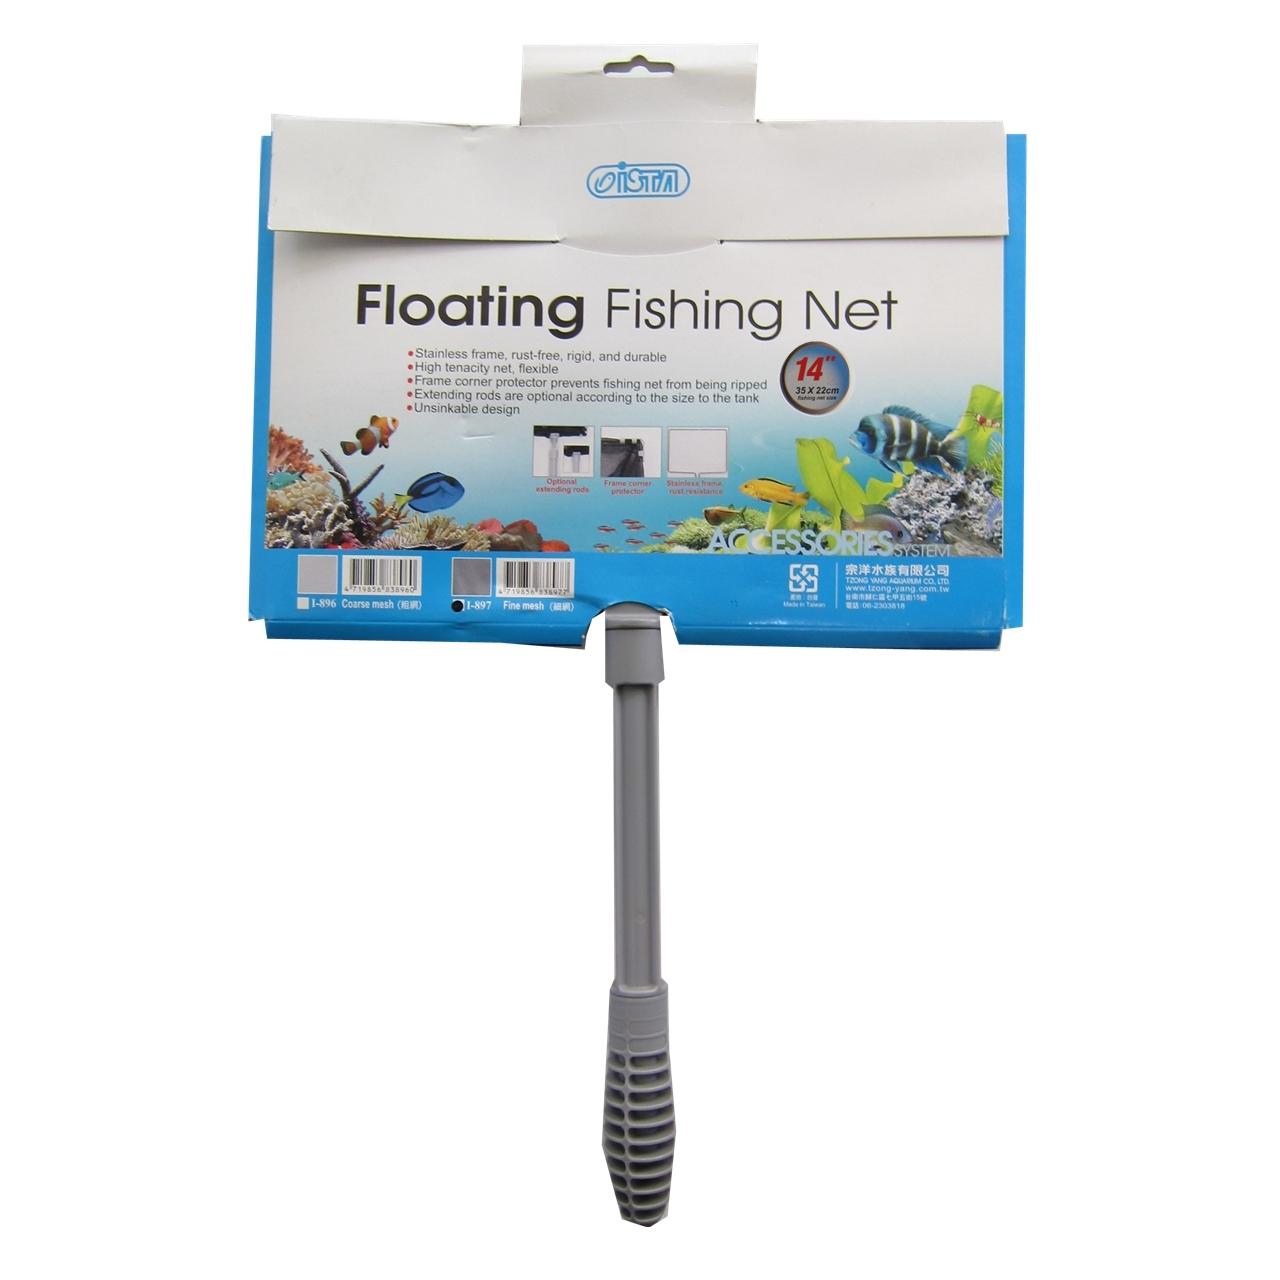 تور ماهی آکواریوم ایستا مدل Floating Fishing Net سایز 14 اینچ